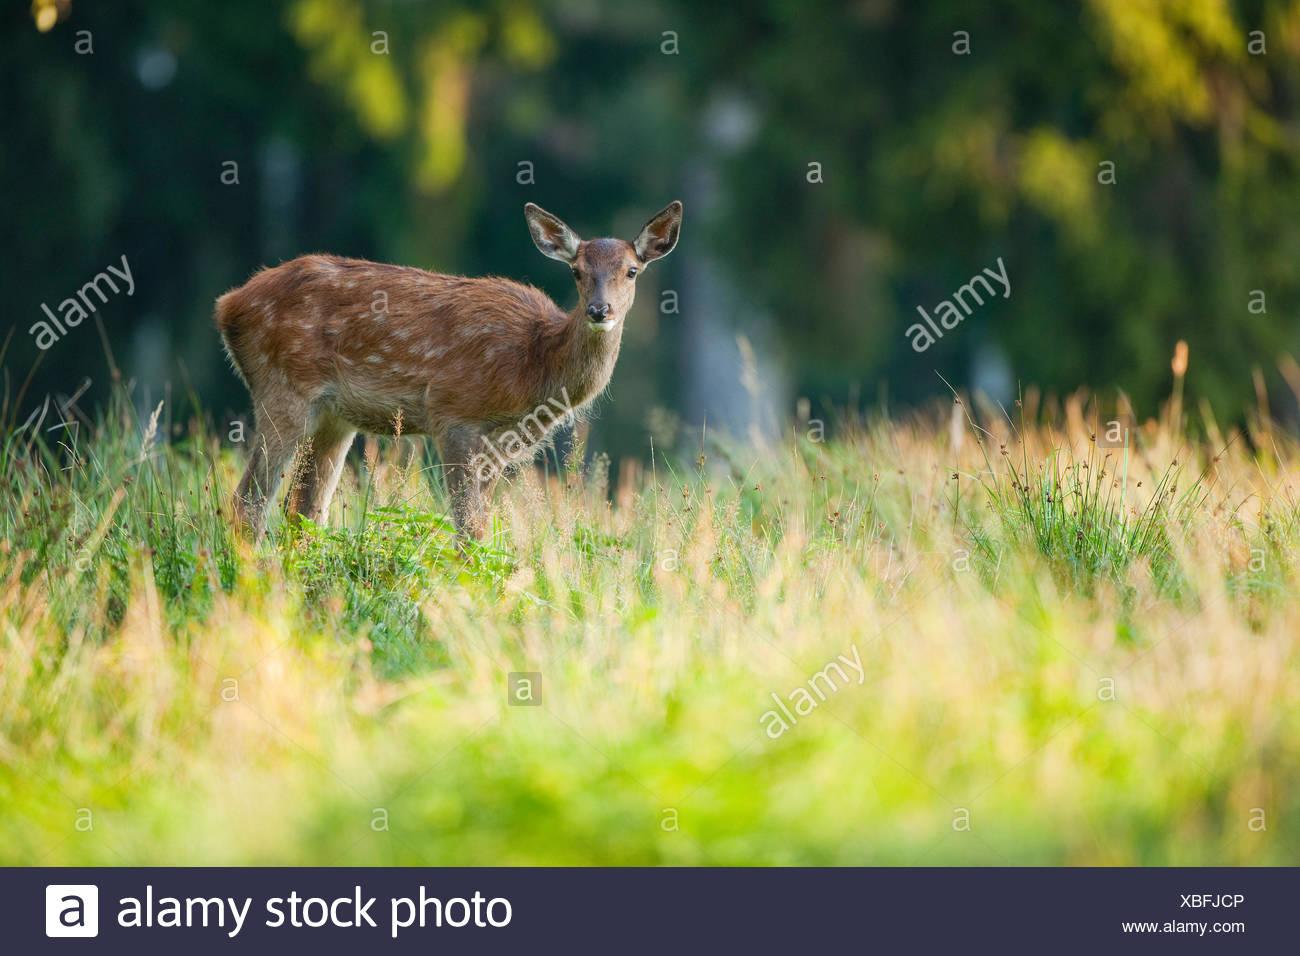 Red deer (Cervus elaphus), fawn, captive, Saxony, Germany - Stock Image